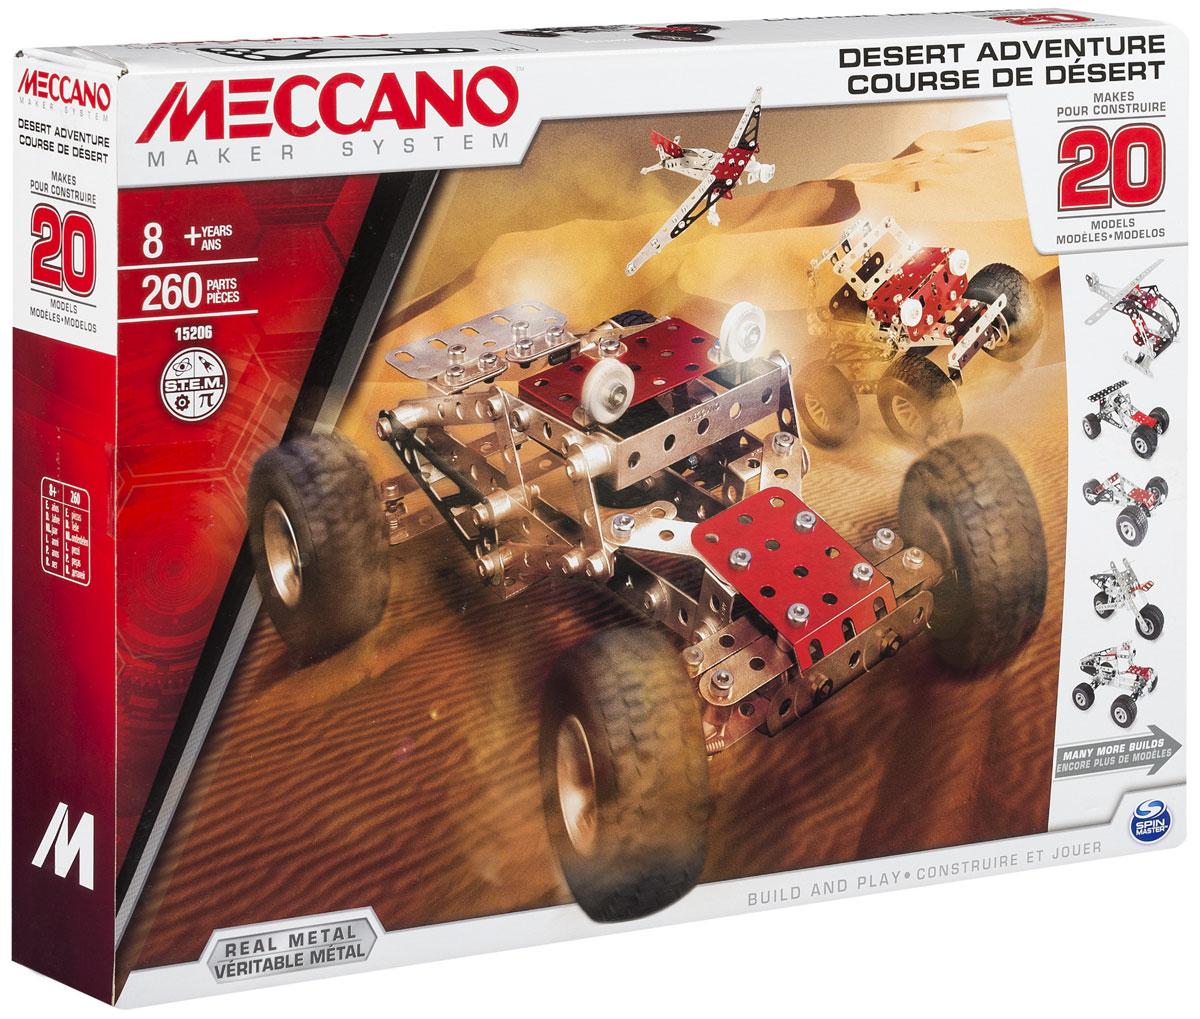 Meccano Конструктор Приключение в пустыне 20 в 1  игрушка meccano набор приключения в пустыне 20 моделей meccano